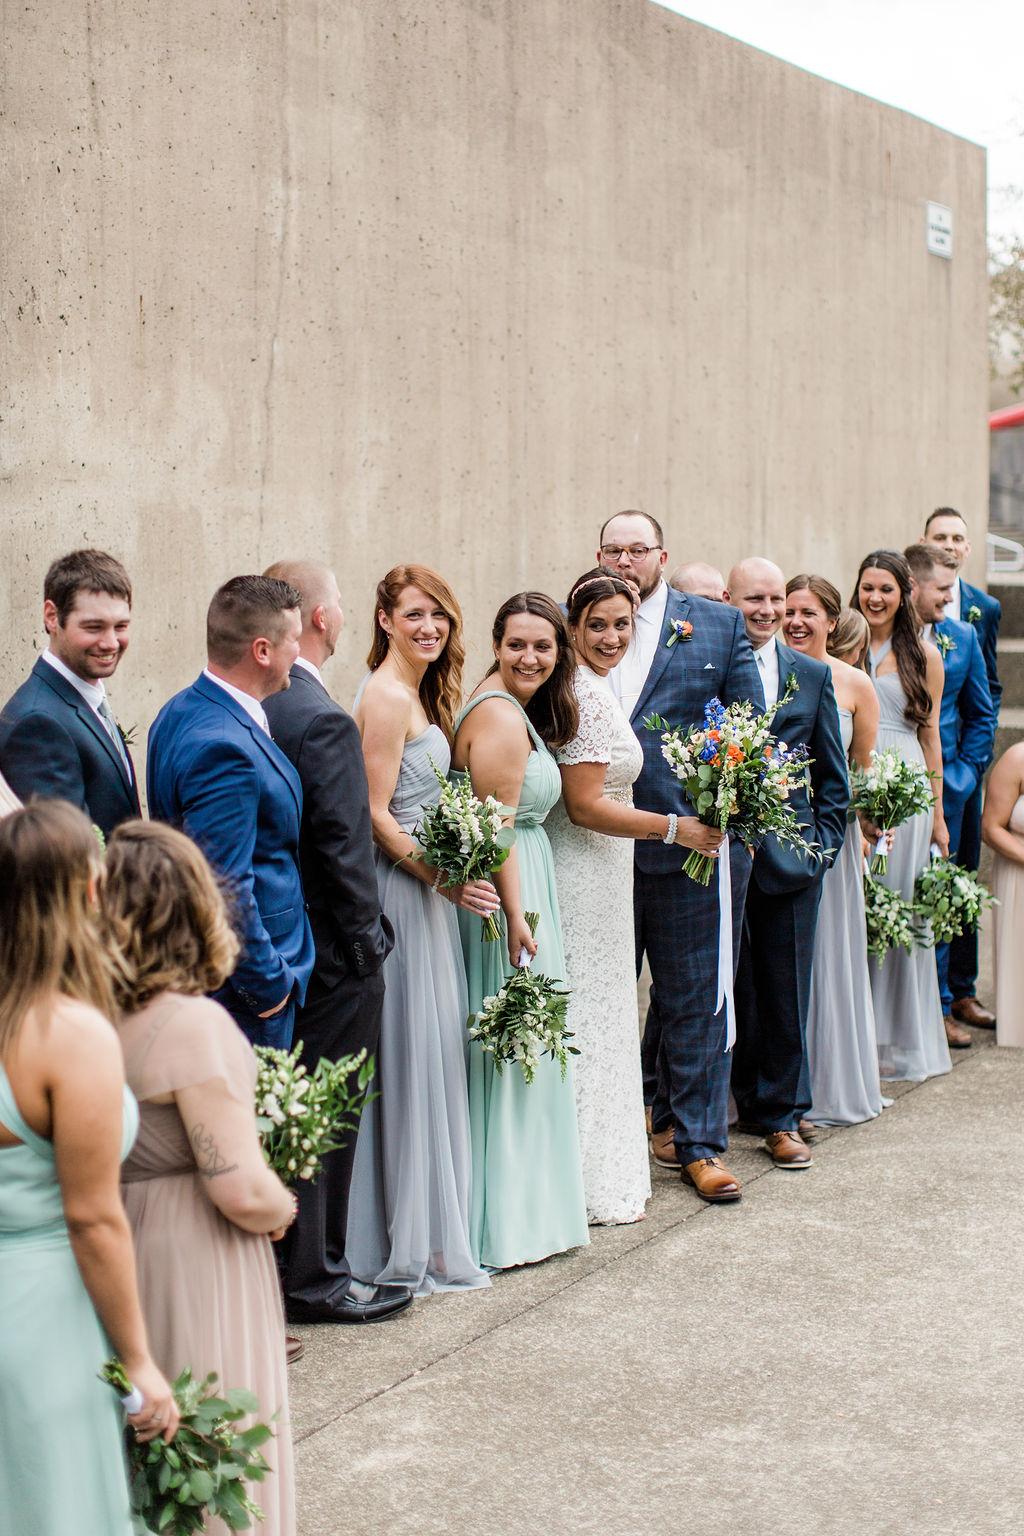 katie_graham_photography_wedding_photographer_luxury_fine_art_destination_wedding_photographer_bemus_point_lakewood_mayville_buffalo_new_york_erie_pennsylvania_fredonia_dunkirk